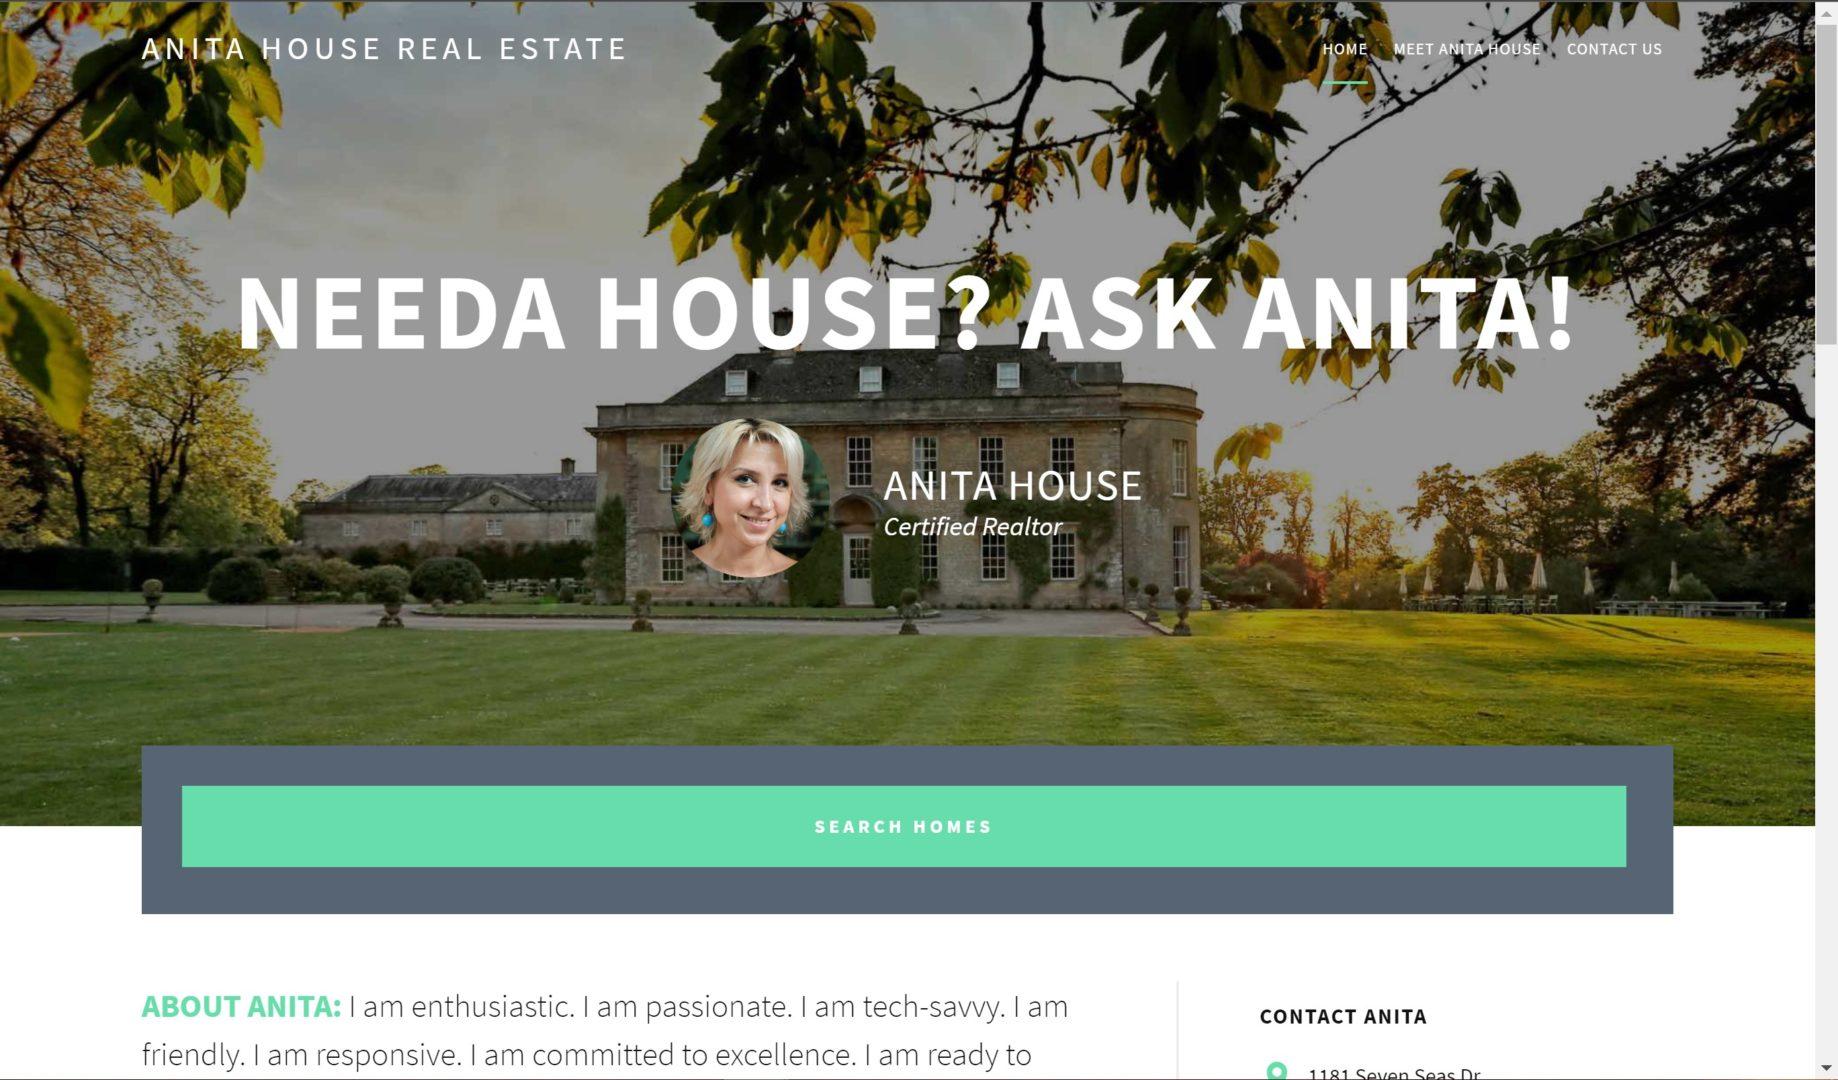 Anita's real estate website